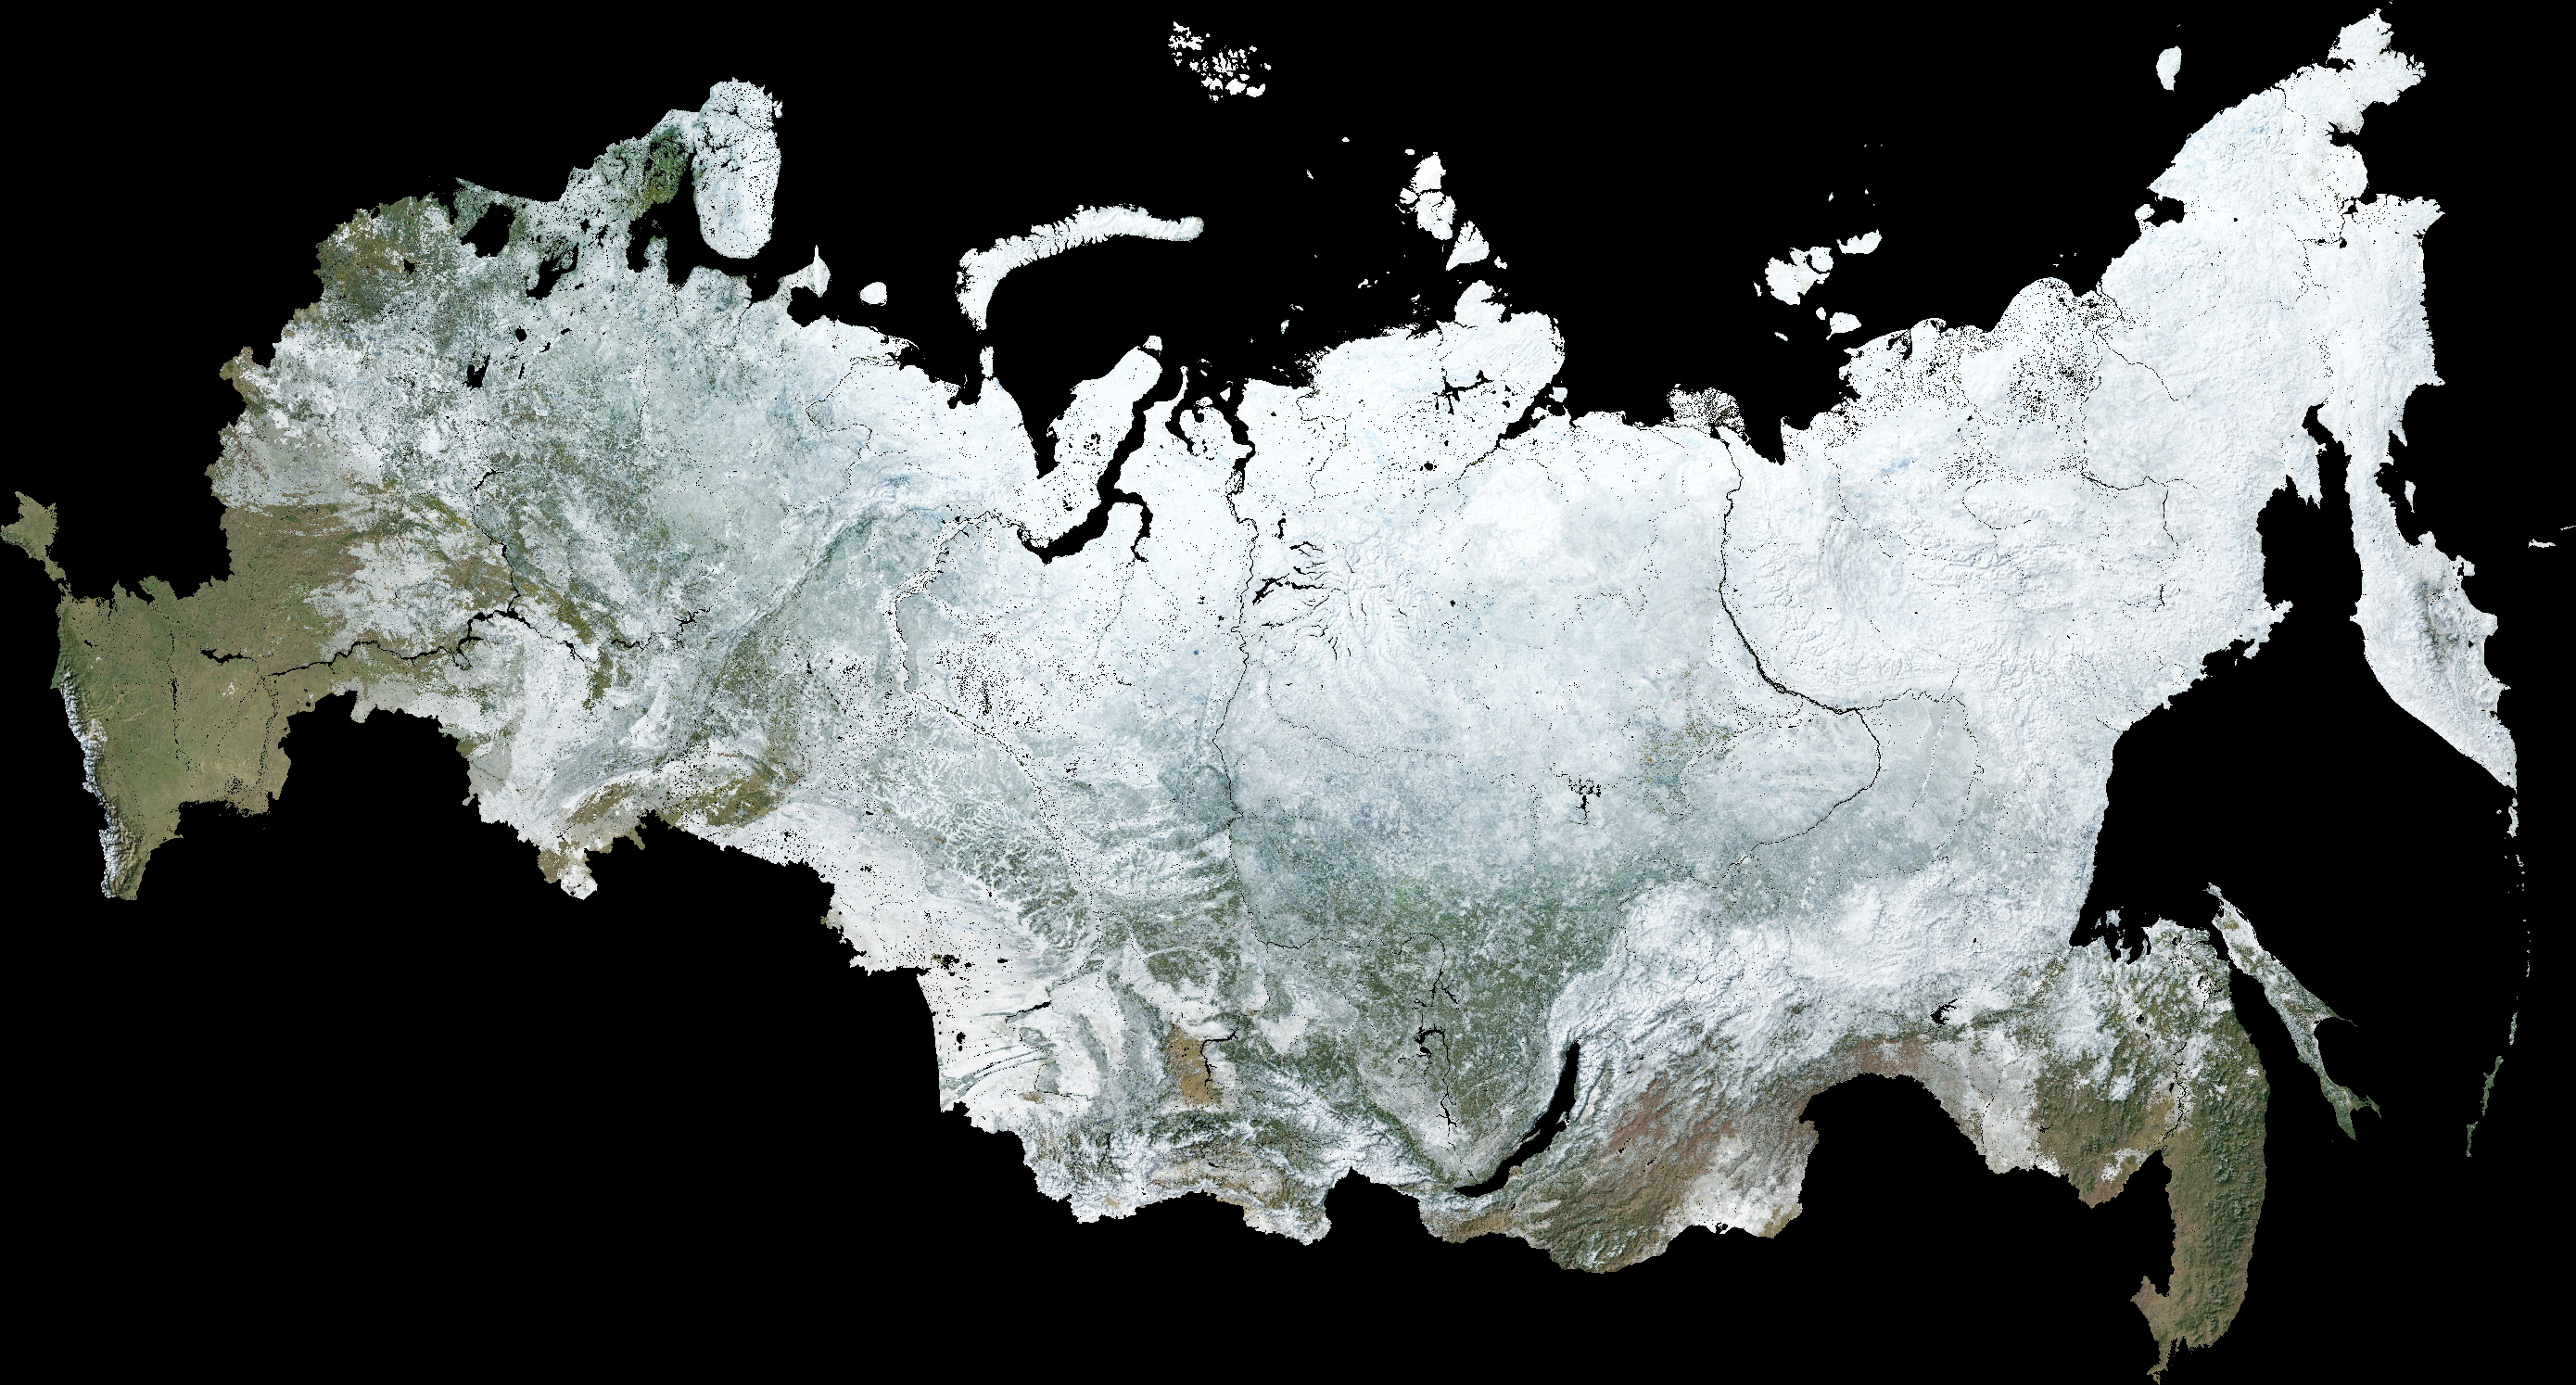 http://www.artlebedev.ru/susha/assets/maps/ru/map-11.jpg